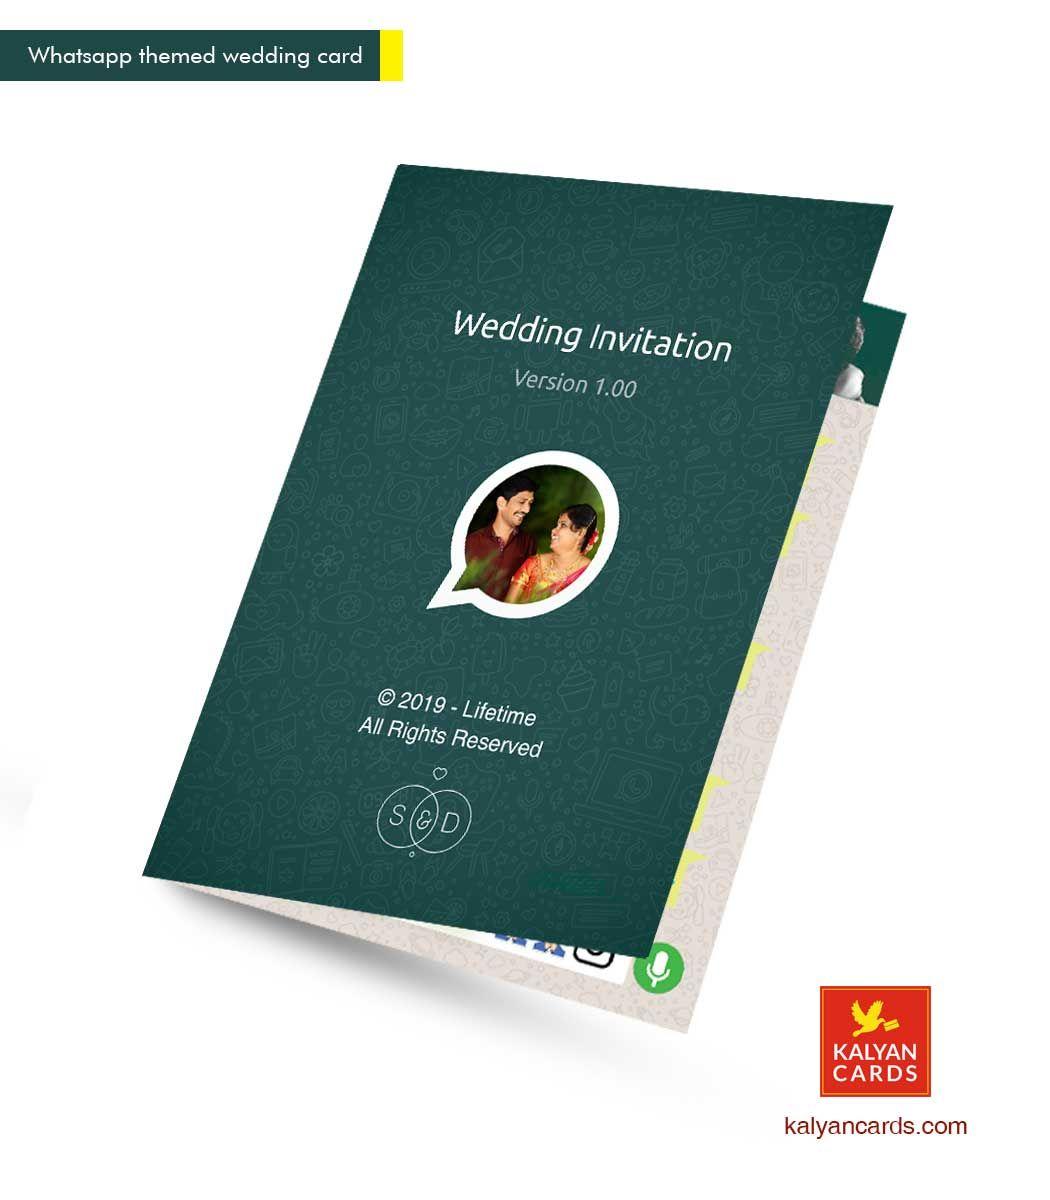 Whatsapp Wedding Invitation Cards Wedding Invitation Cards Online Wedding Invitation Cards Wedding Cards